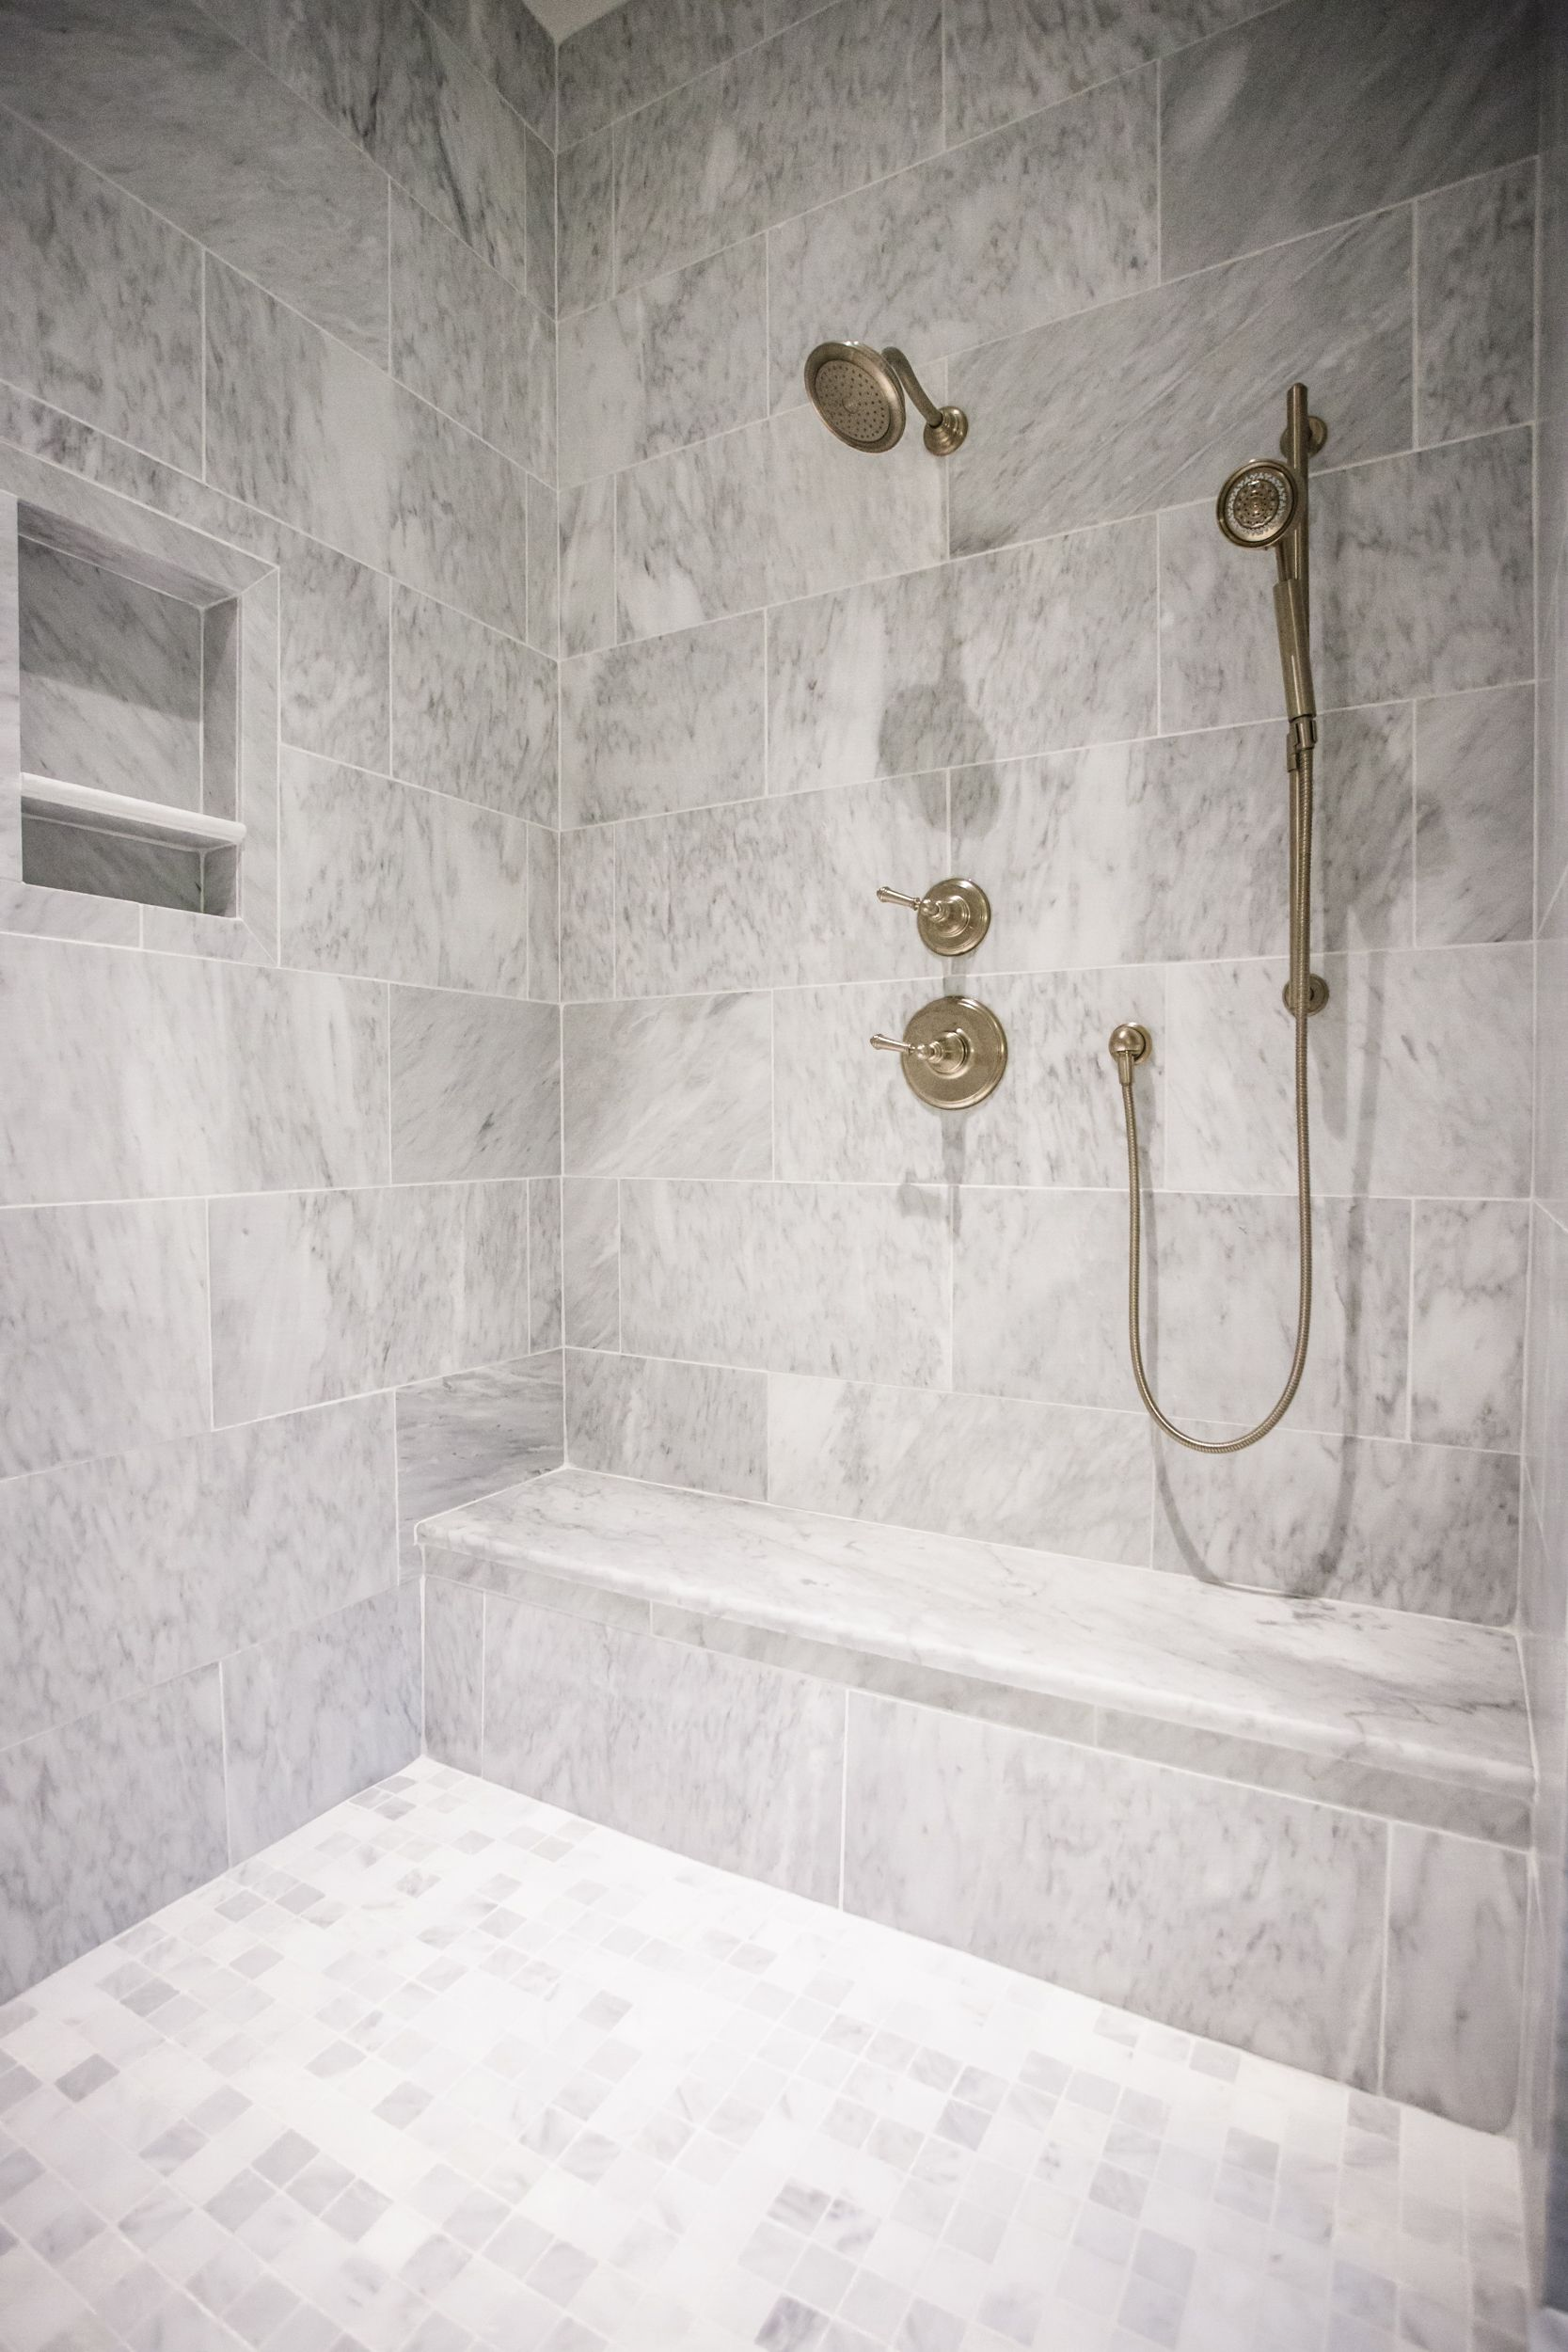 Chandelier Devleopment - White marble and antique brass plumbing ...